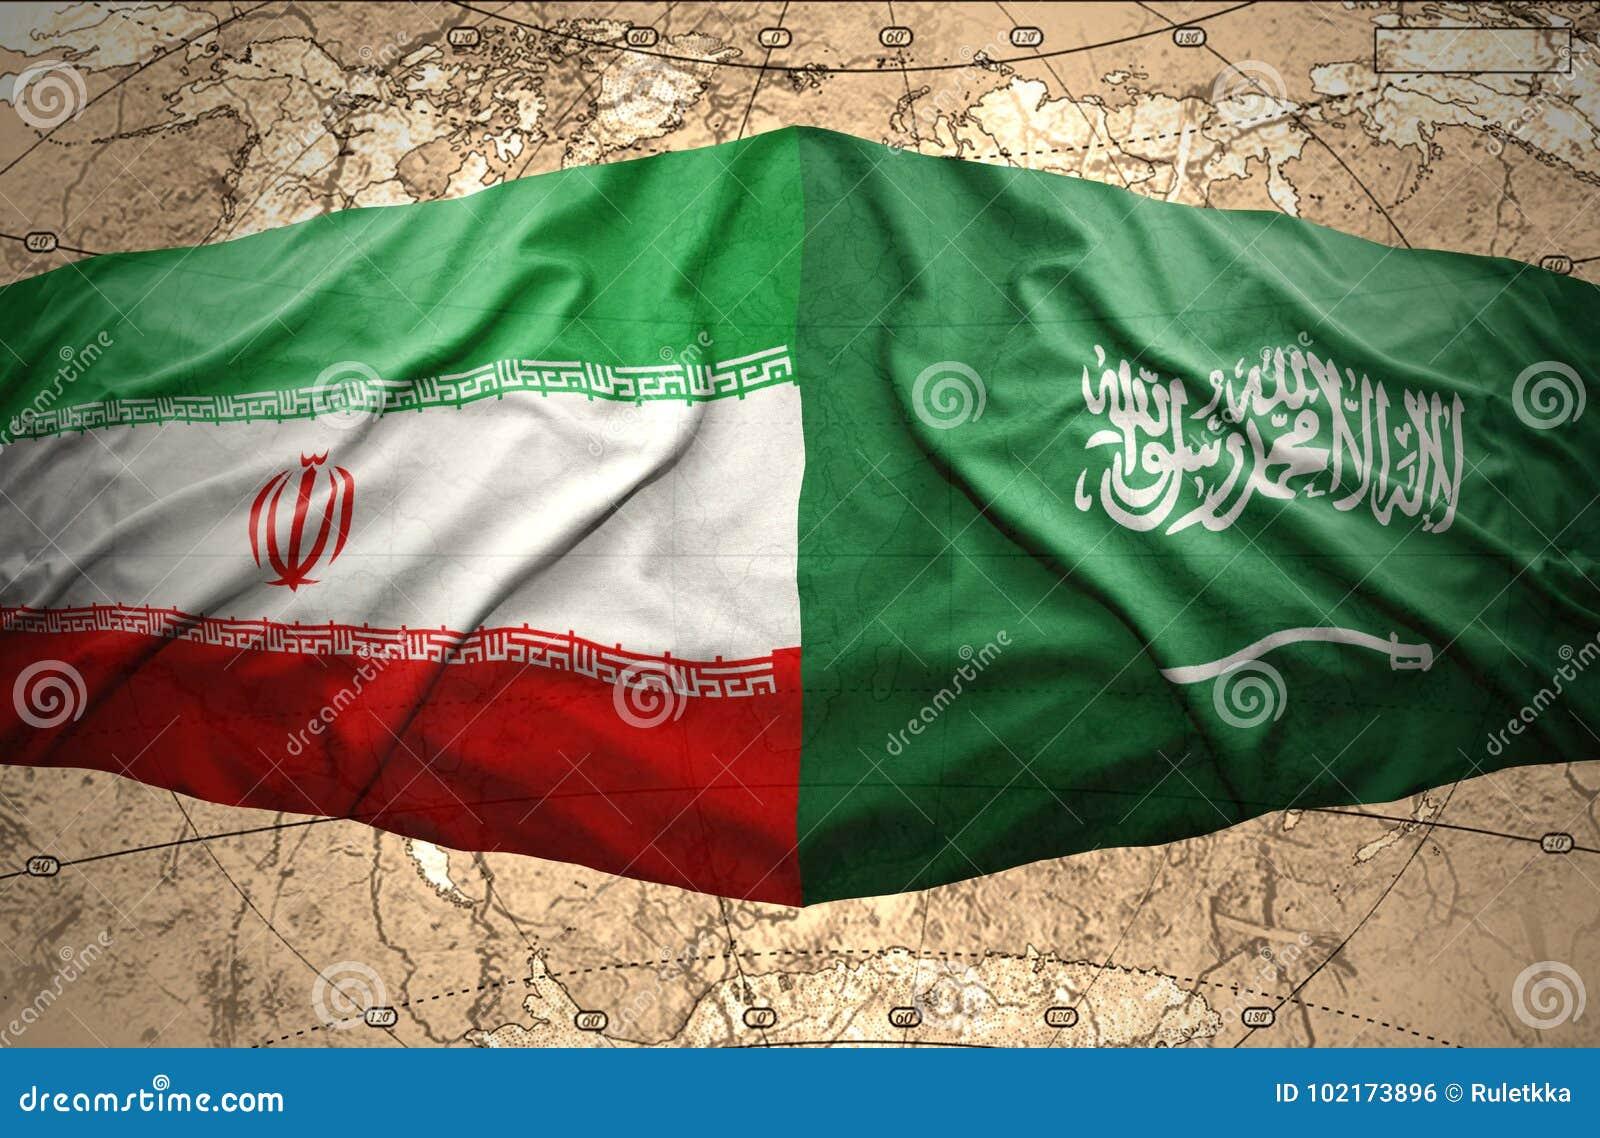 Saudi Arabia and Iran stock photo. Image of contact - 102173896